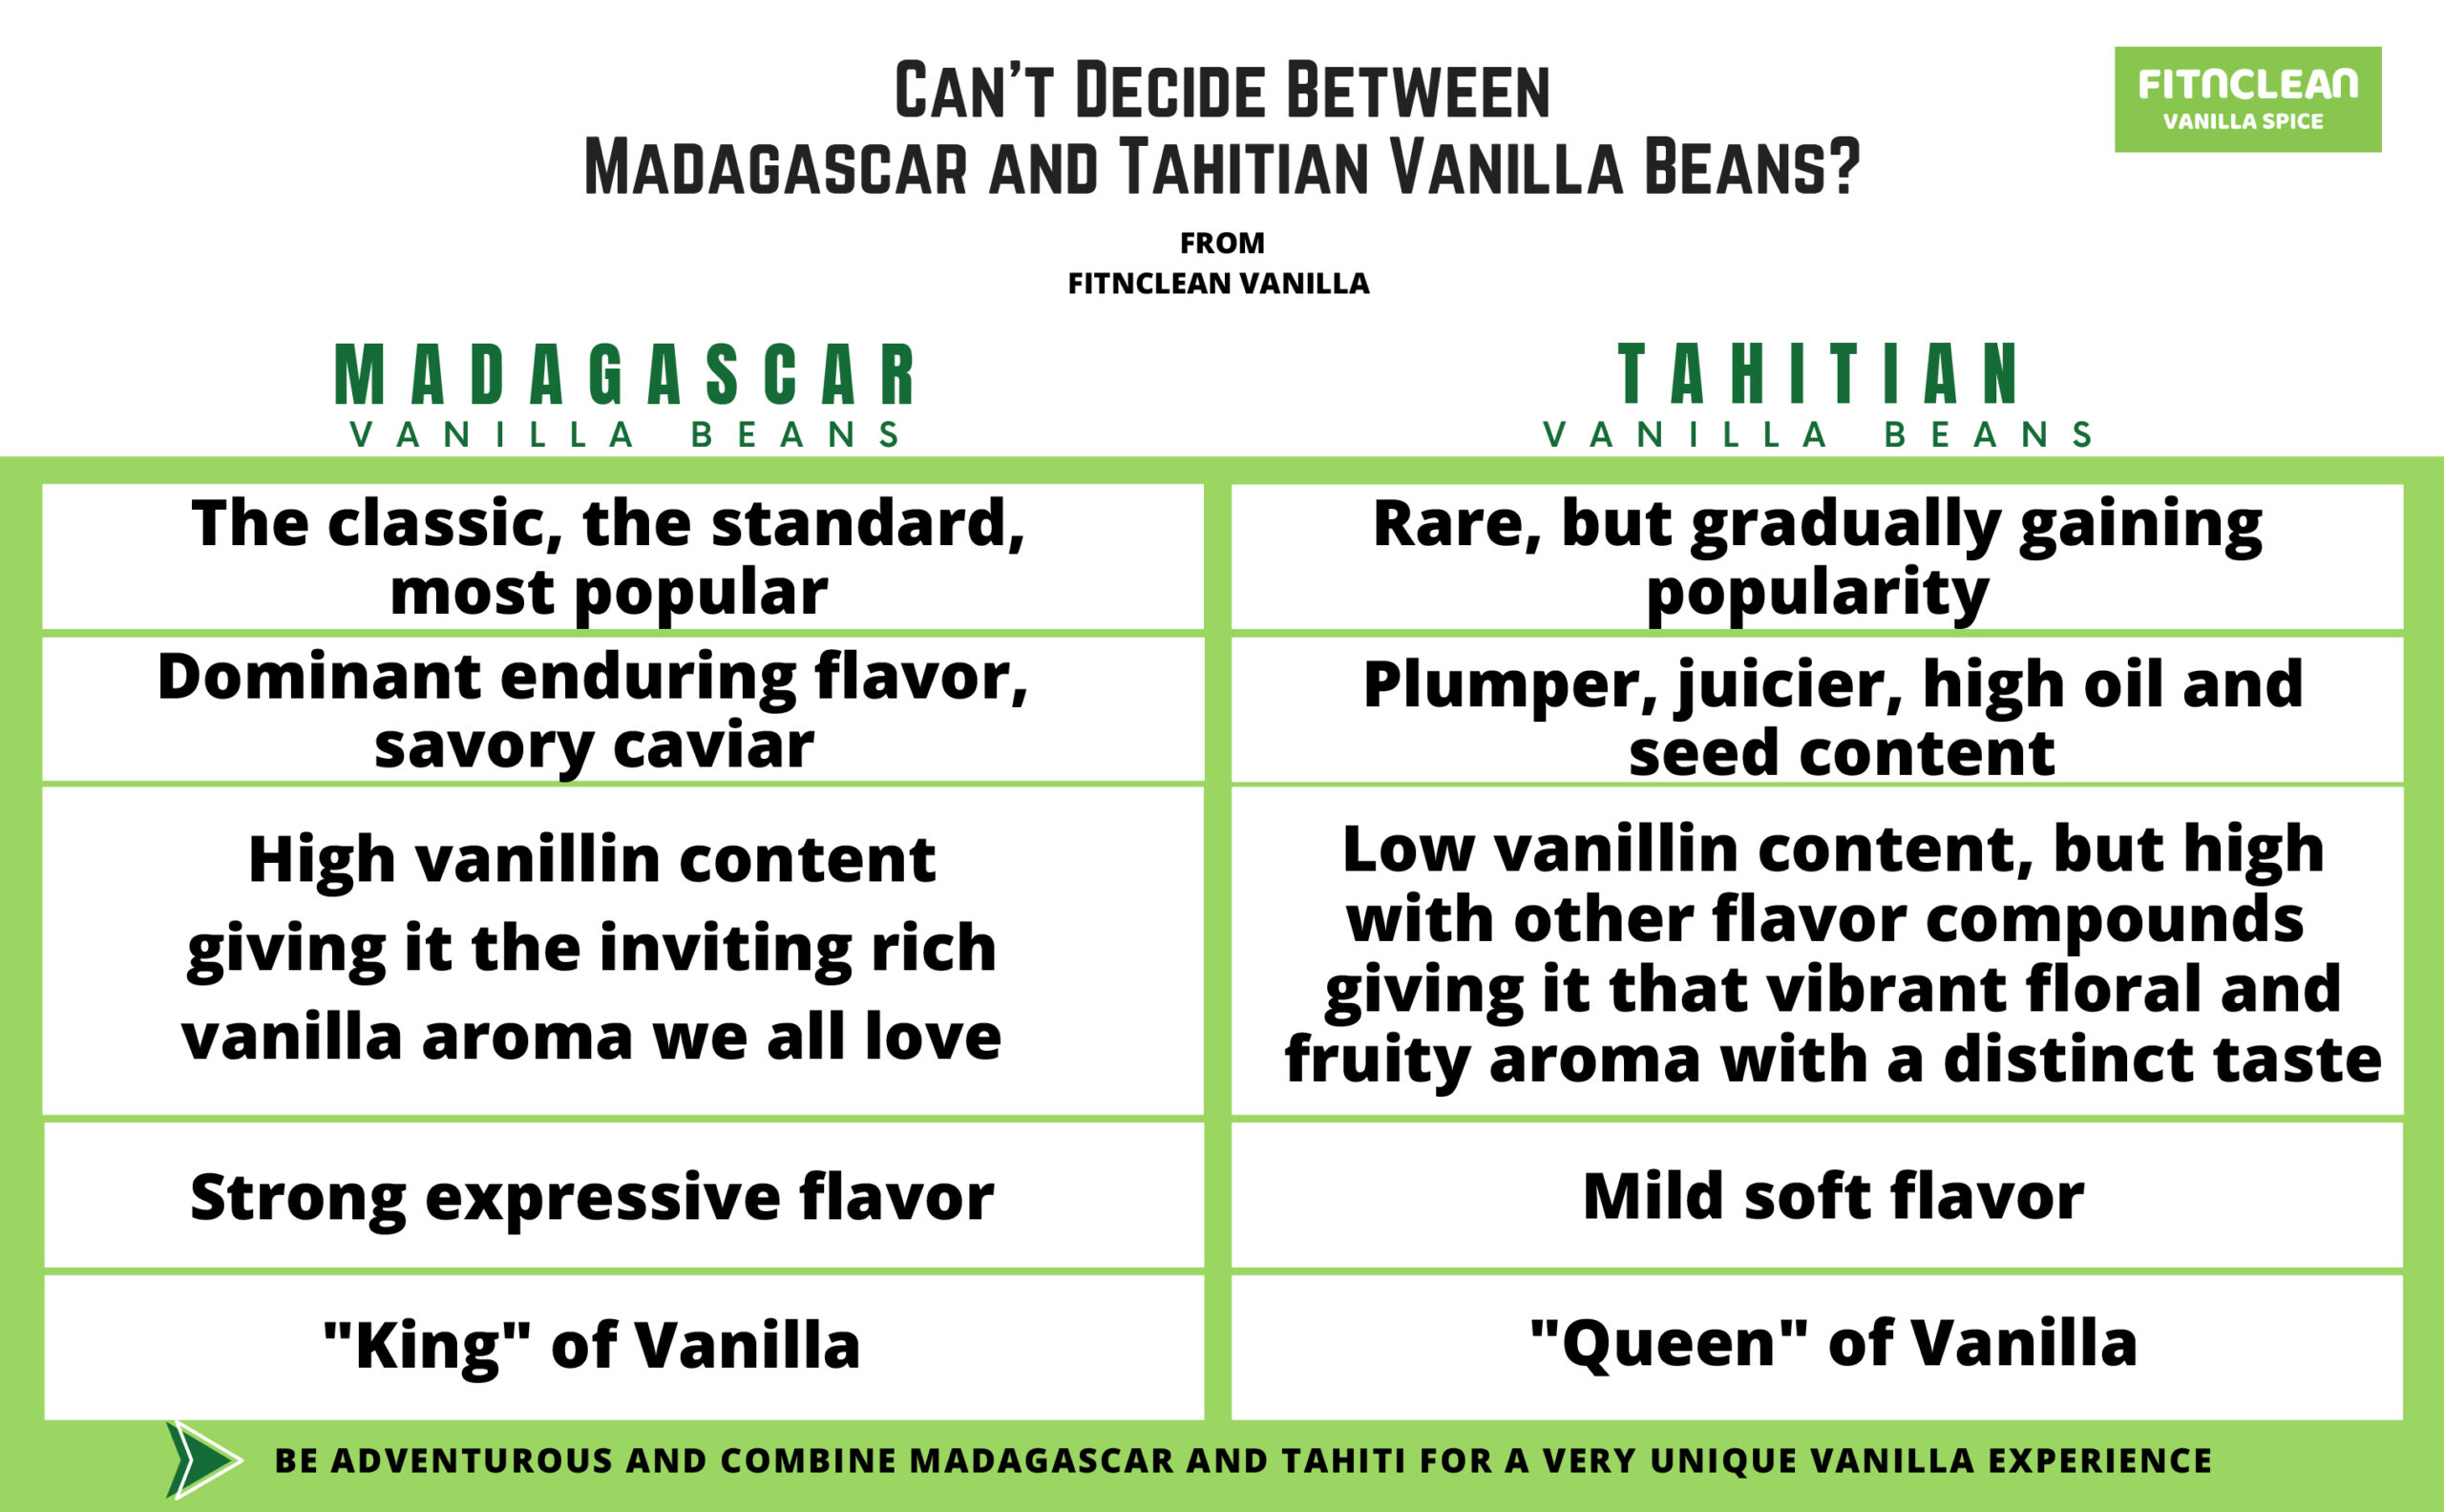 Madagascar & Tahitian Vanilla Beans